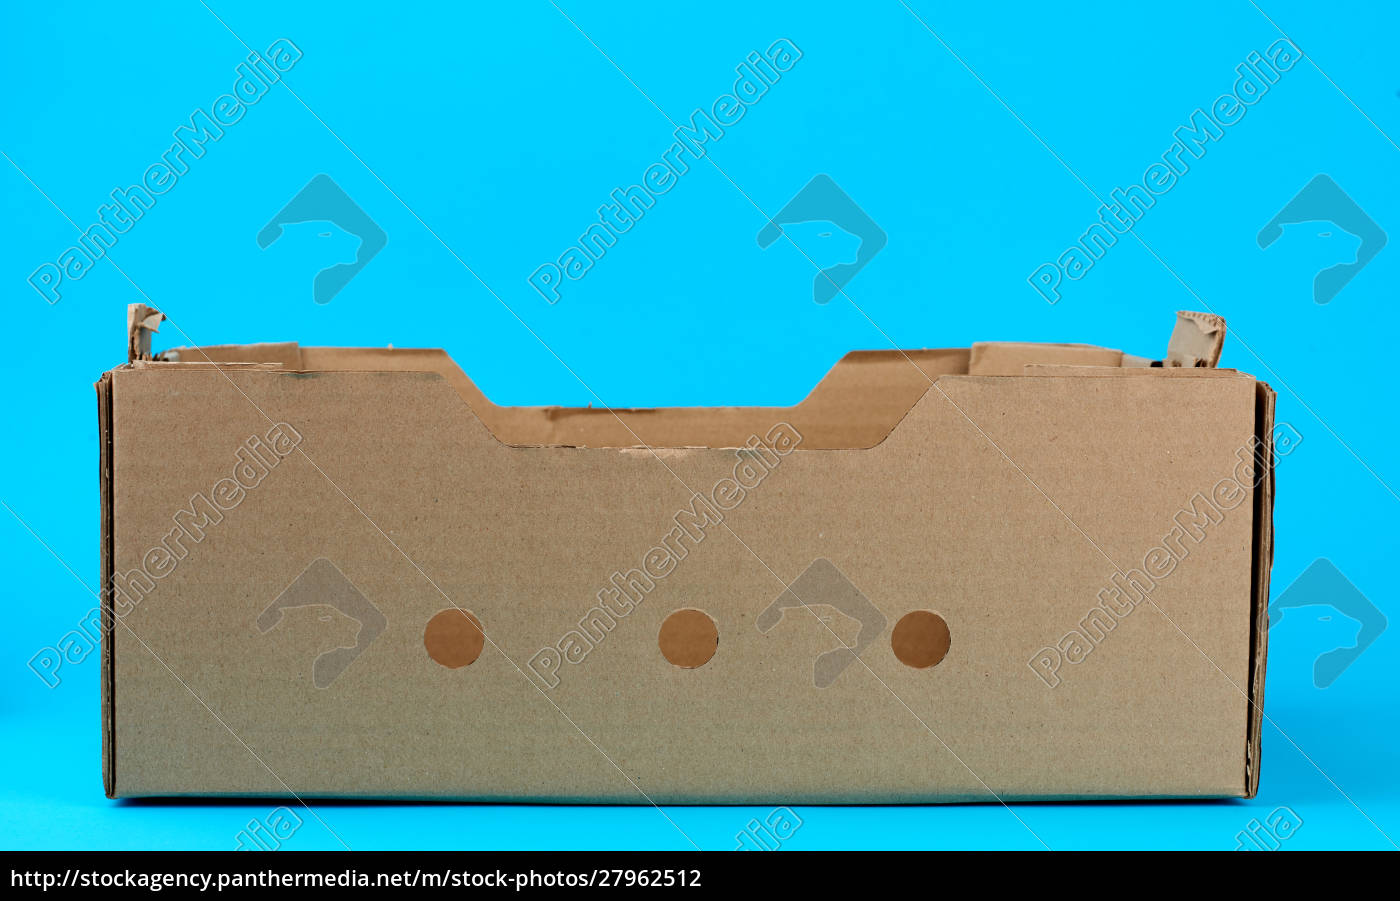 rectangular, empty, cardboard, box, of, brown - 27962512